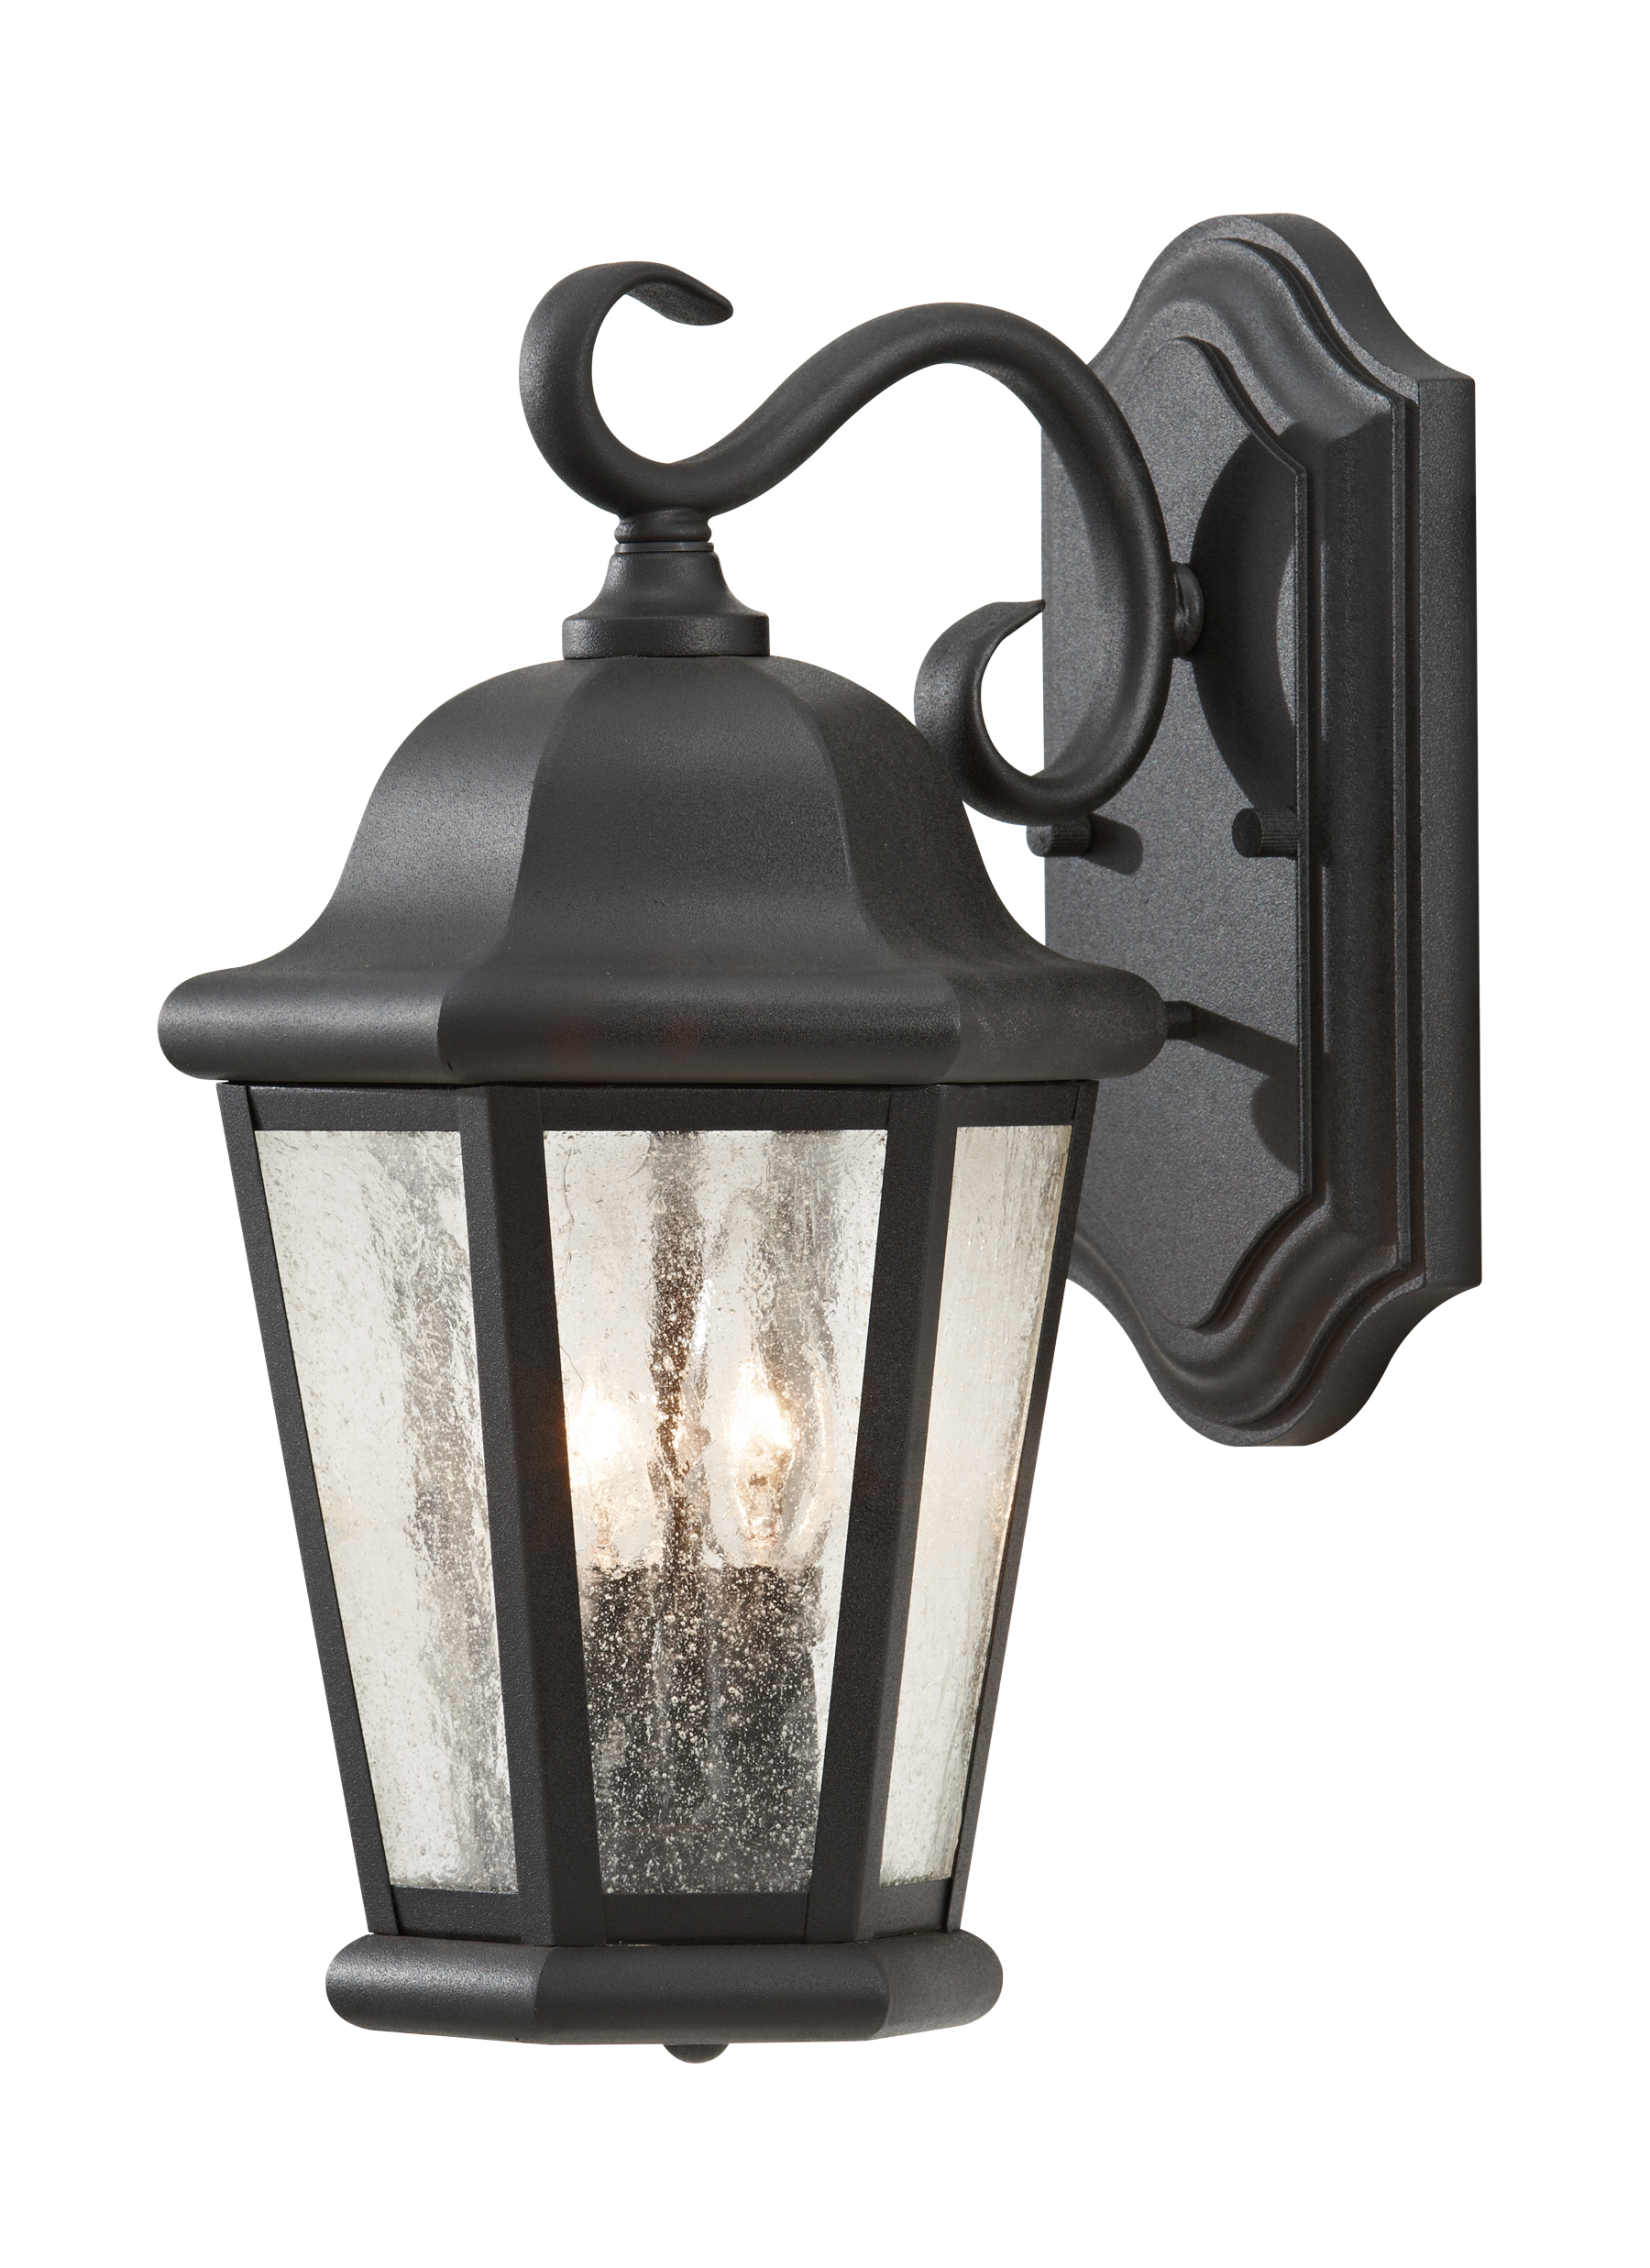 Lovely Outdoor Lantern Lights